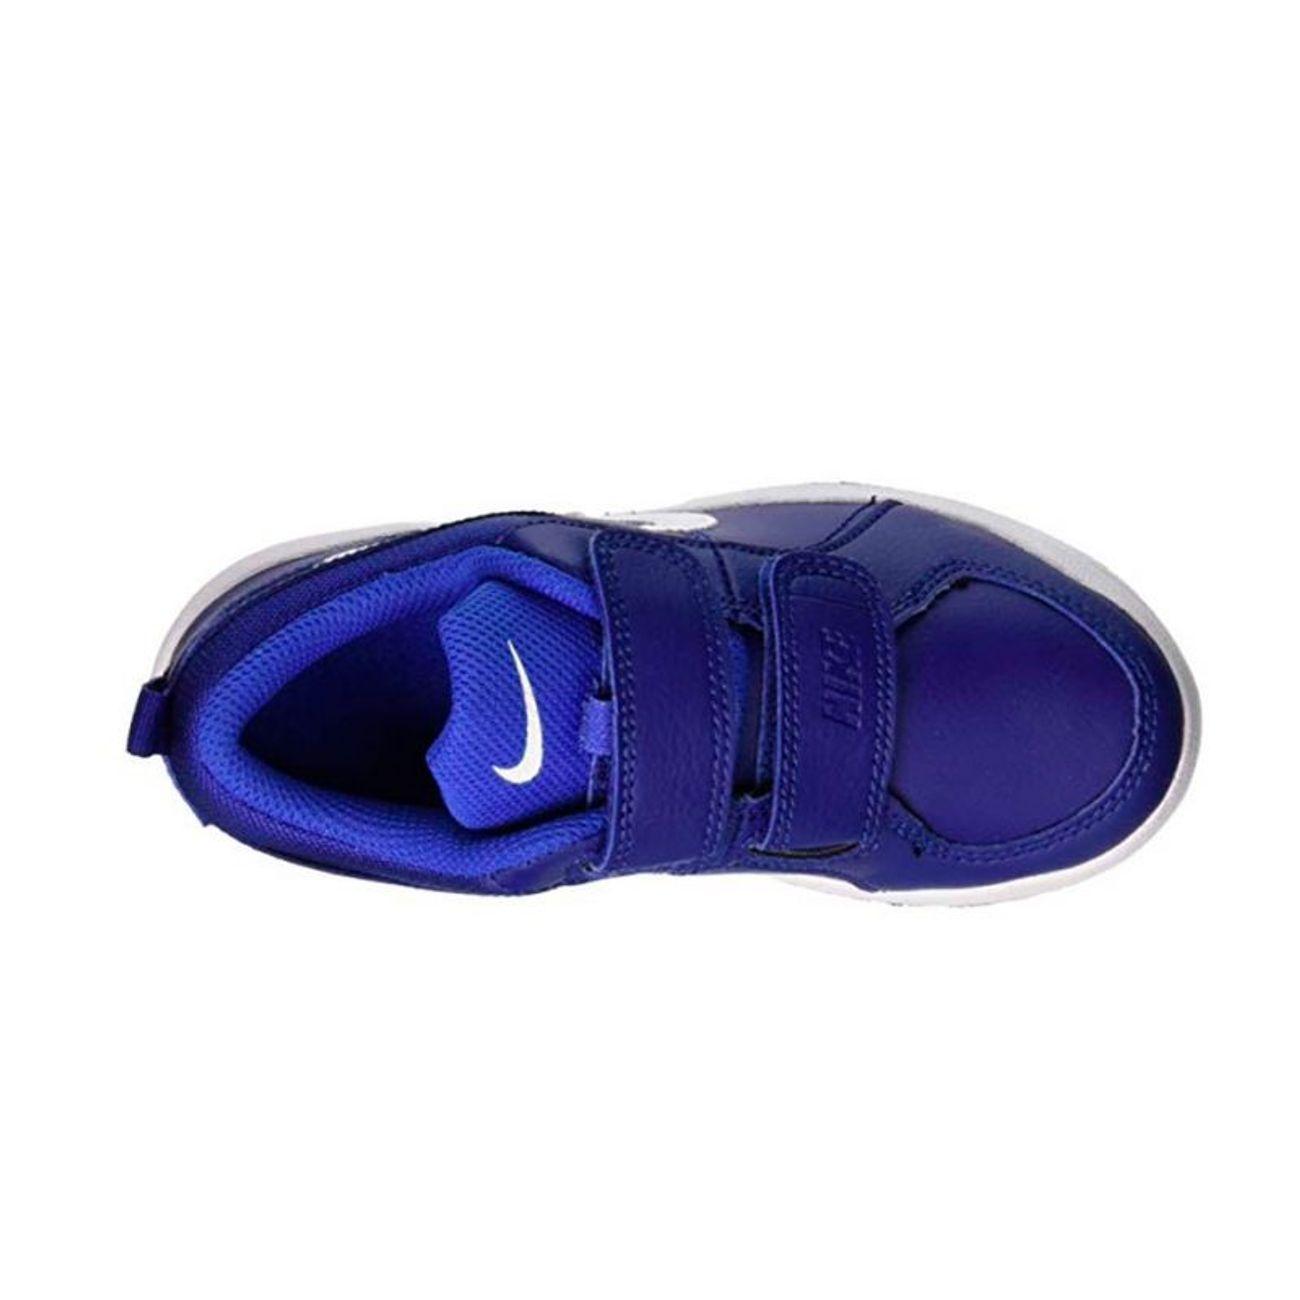 Bebe 4 Padel Adulte Nike Bleu Ni454500 Pico 409 Psv trhdsQ